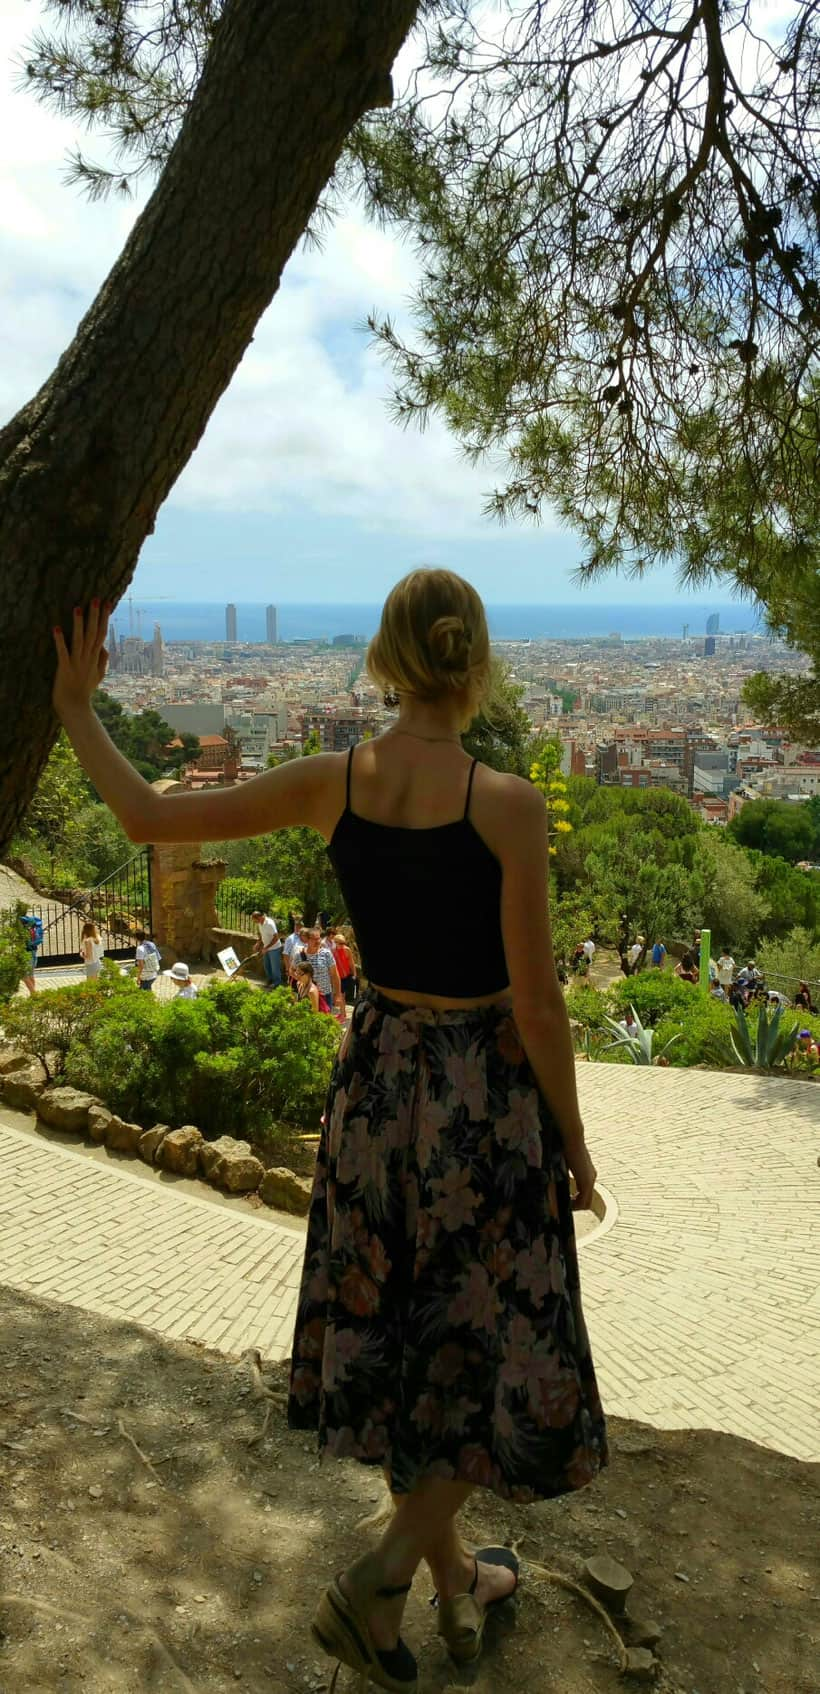 Barcelona, erasmus, traveling, weekend, park guell, nomad, nomada, reunion, viaje, viajar, spain espana